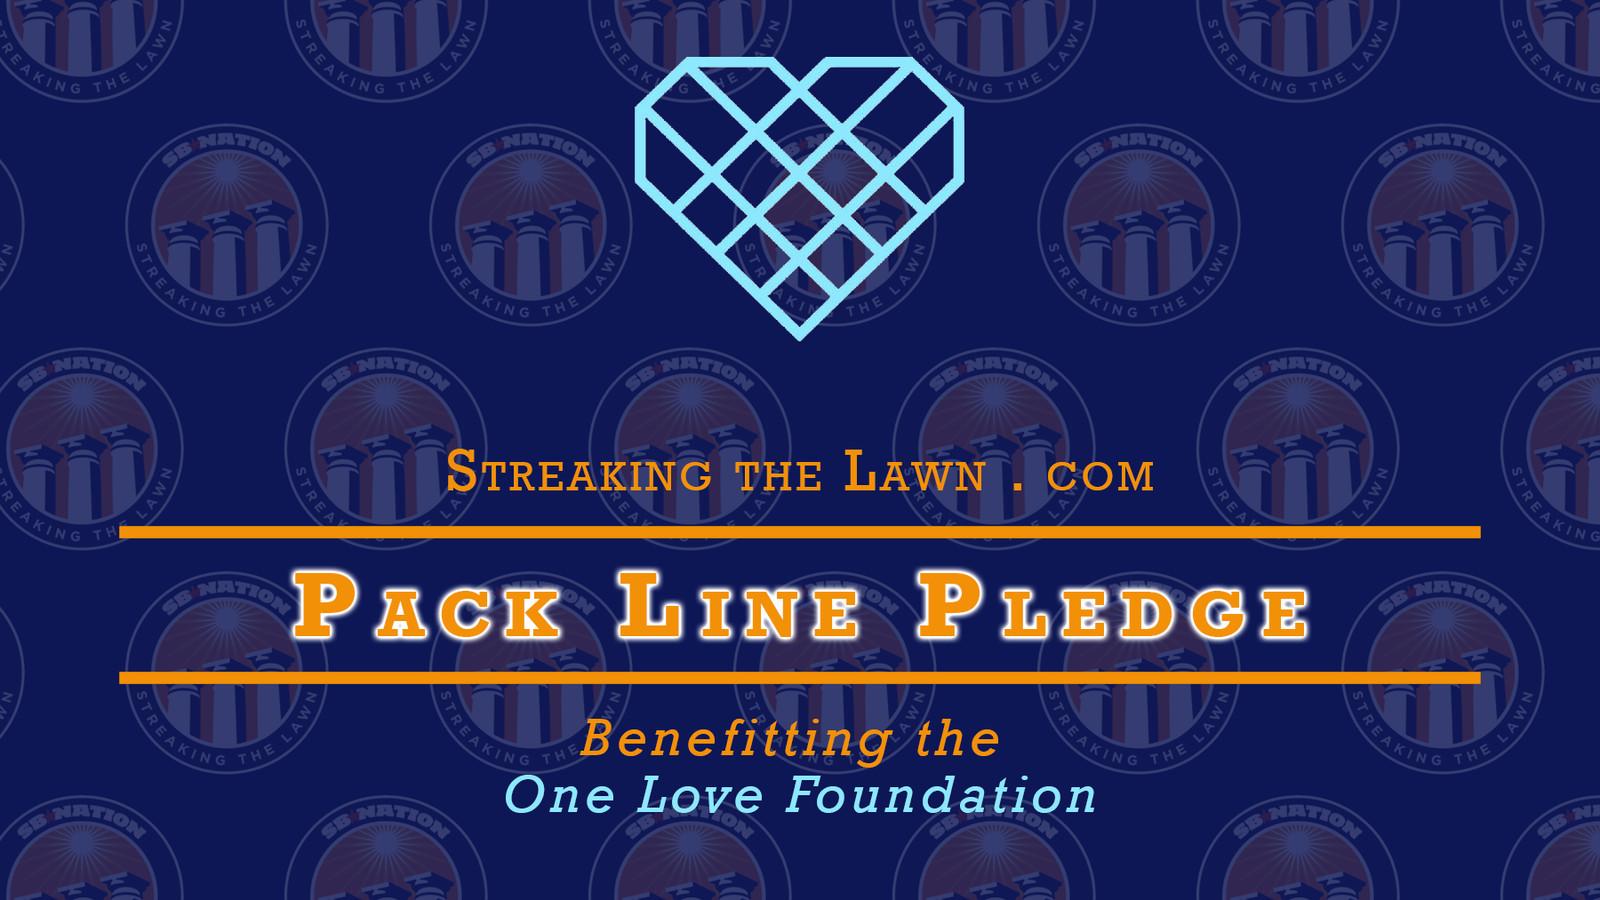 Big_pack_line_pledge_2016_17.0